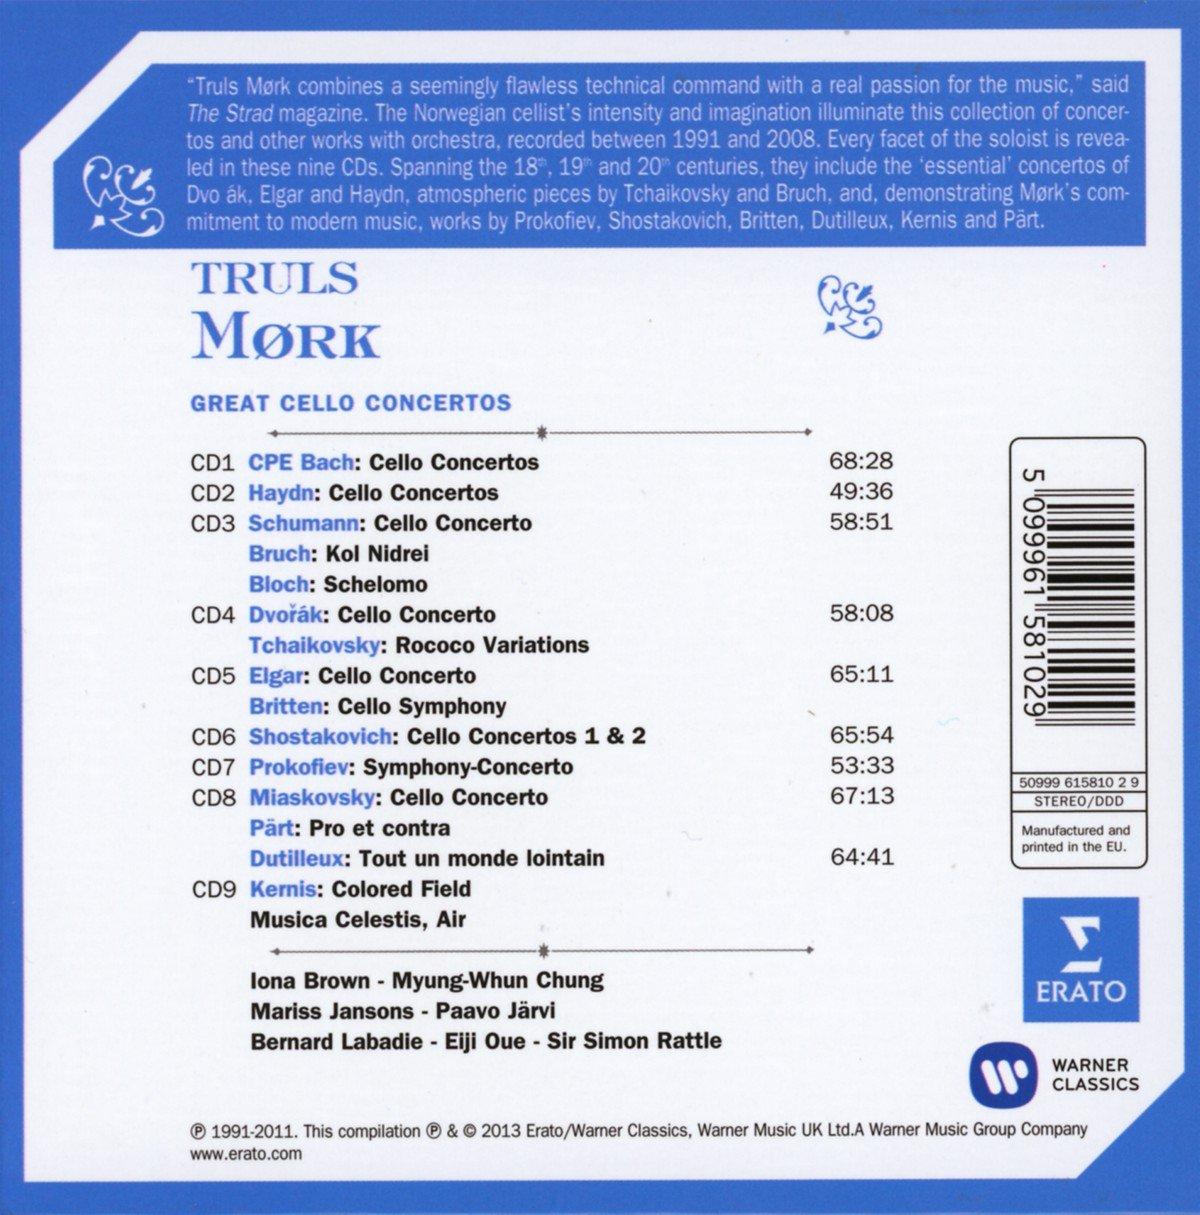 truls - Truls Mørk 71IwV9tnq-L._SL1215_